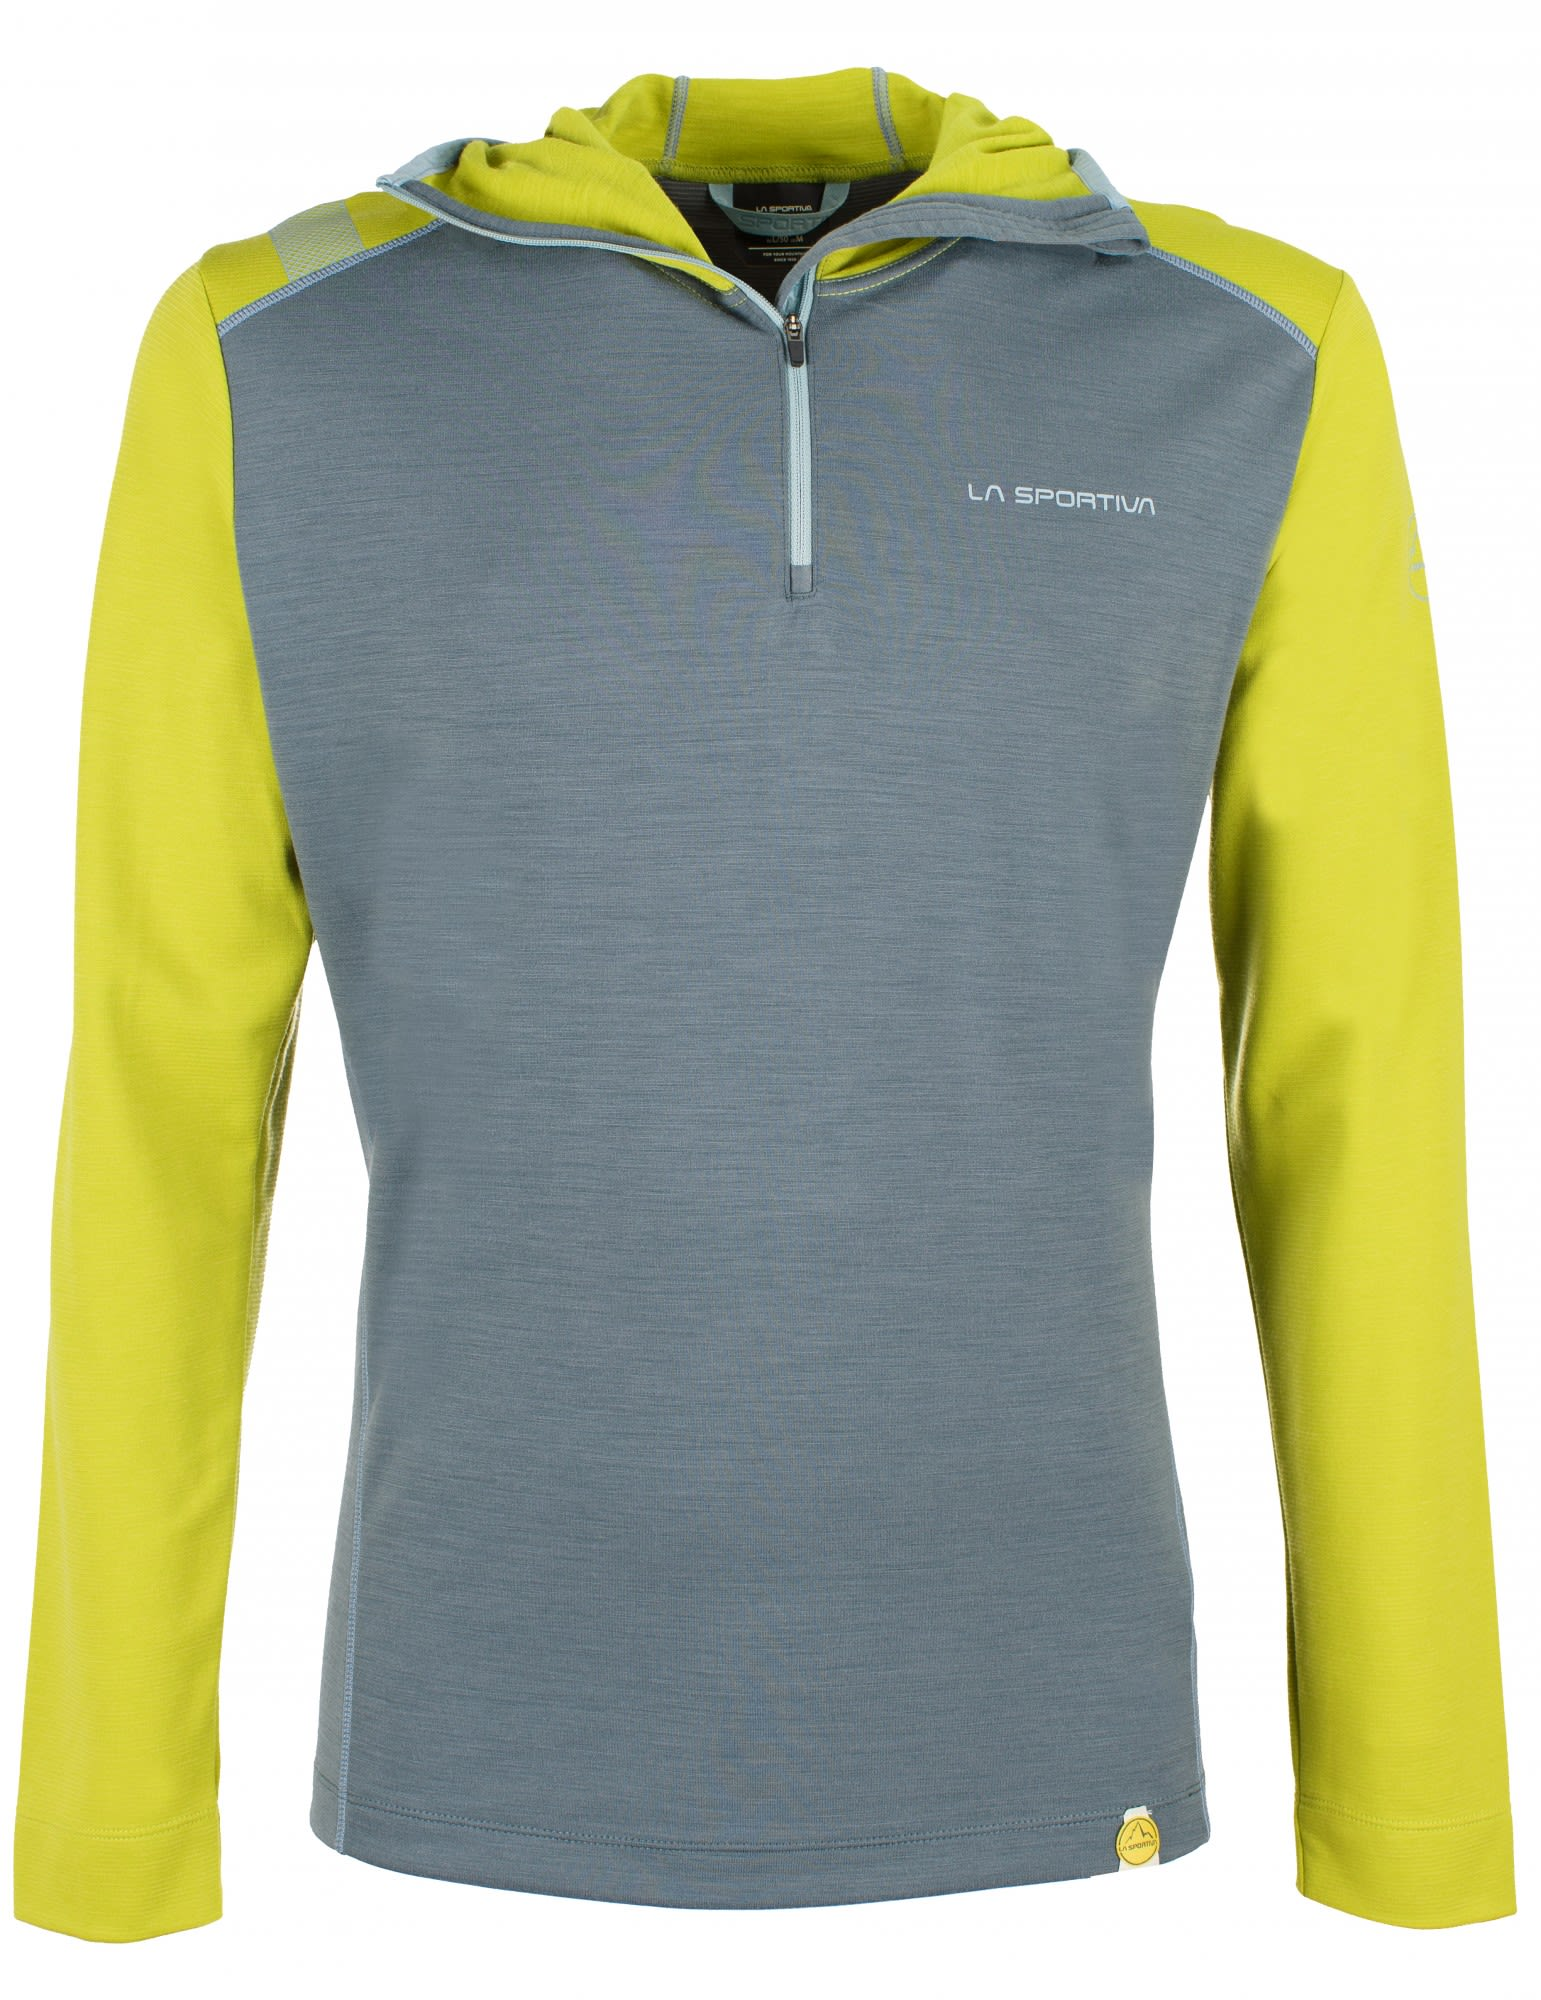 La Sportiva M Stratosphere Hoody | Größe S,M,L,XL | Herren Langarm-Shirt